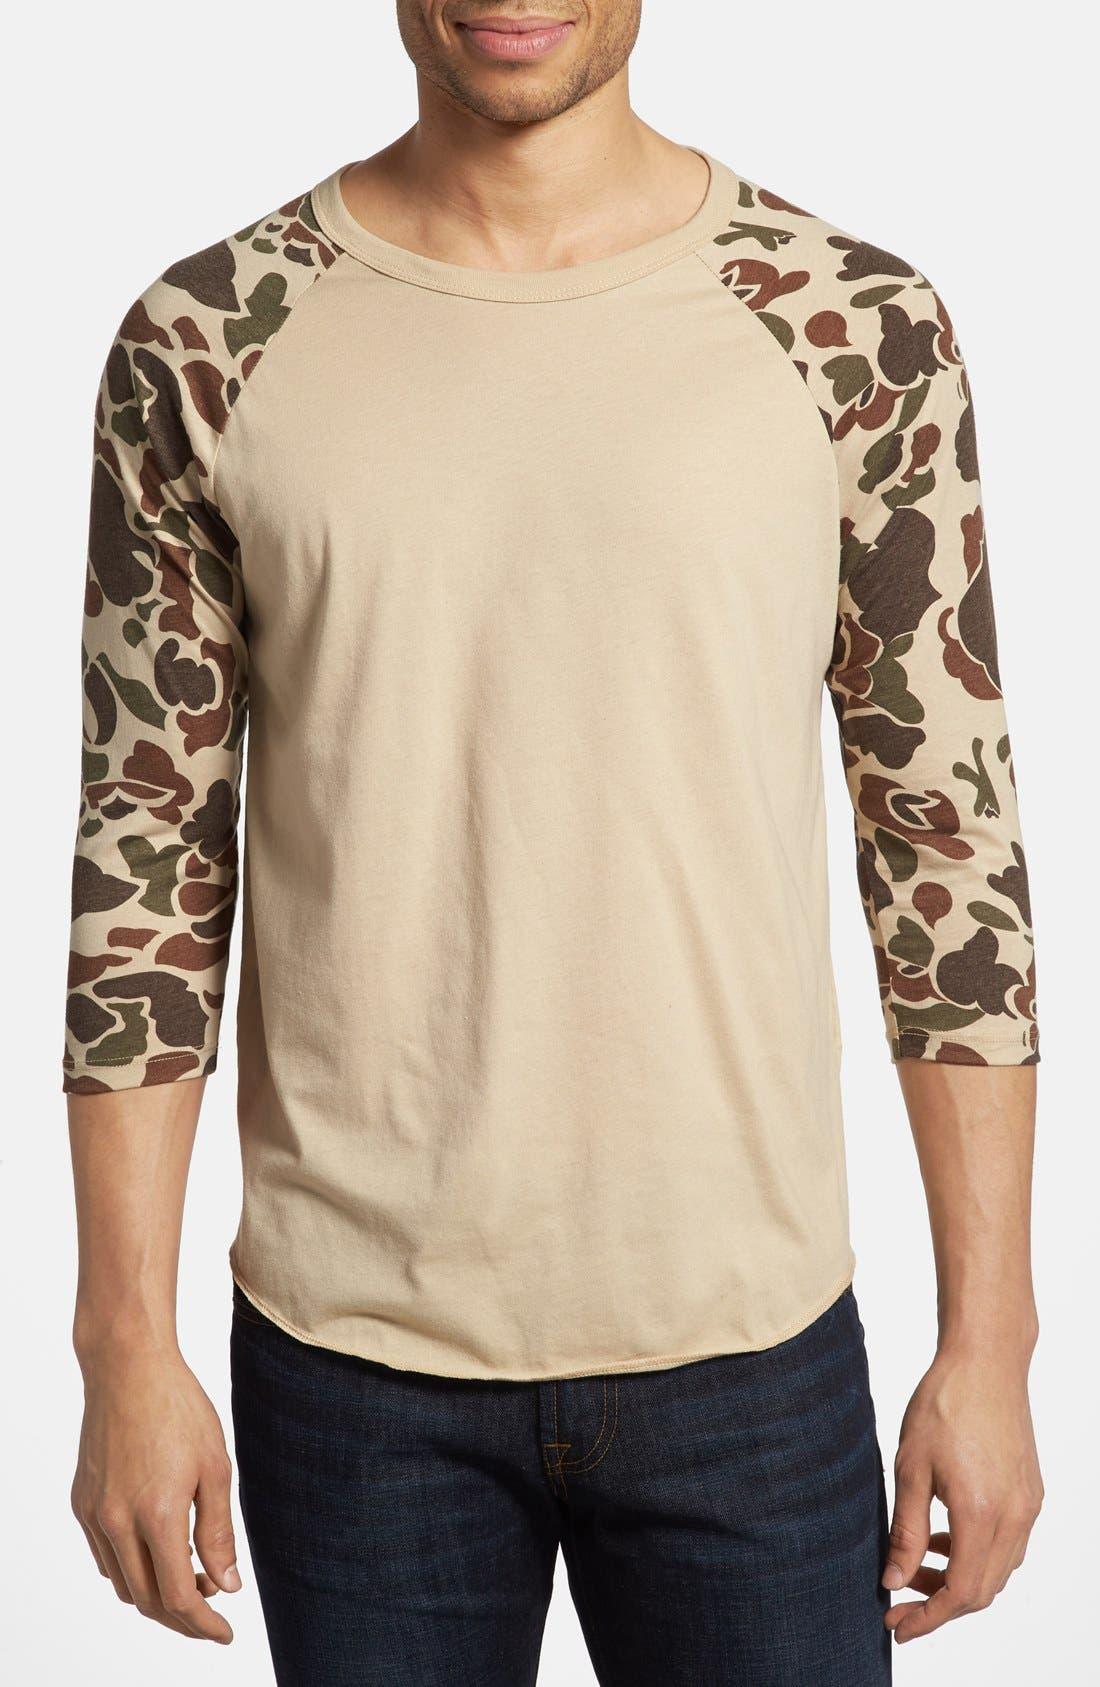 Main Image - Obey 'Camo' Baseball T-Shirt